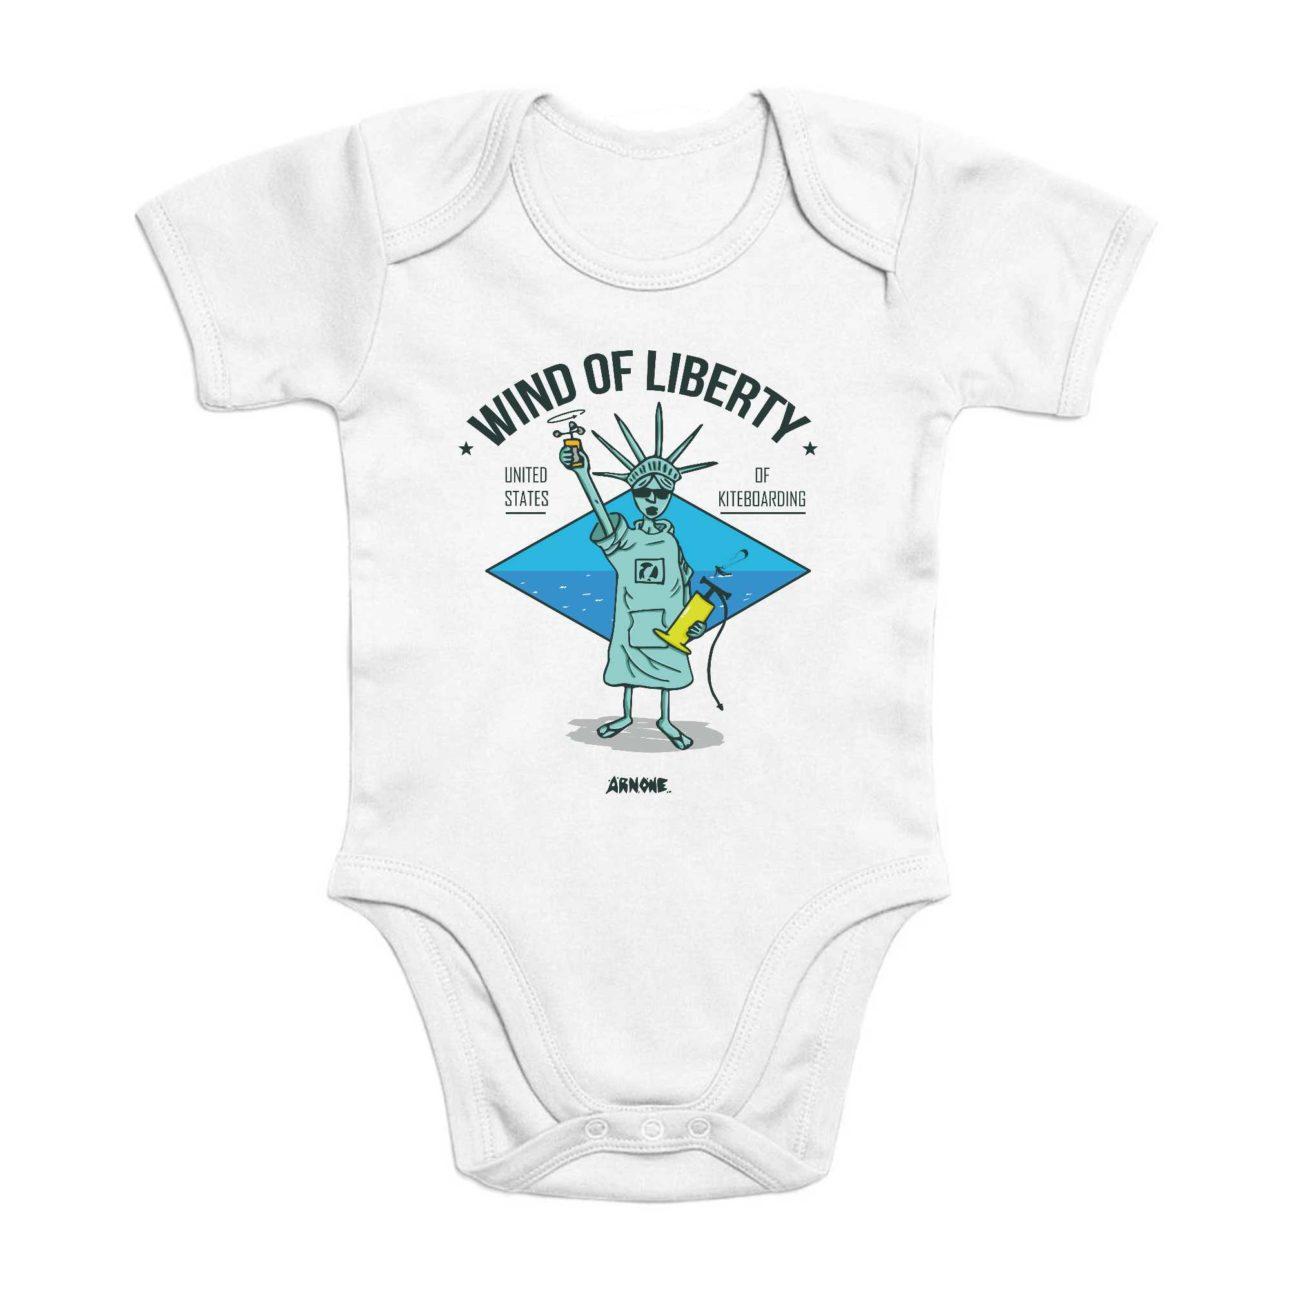 Wind of Liberty